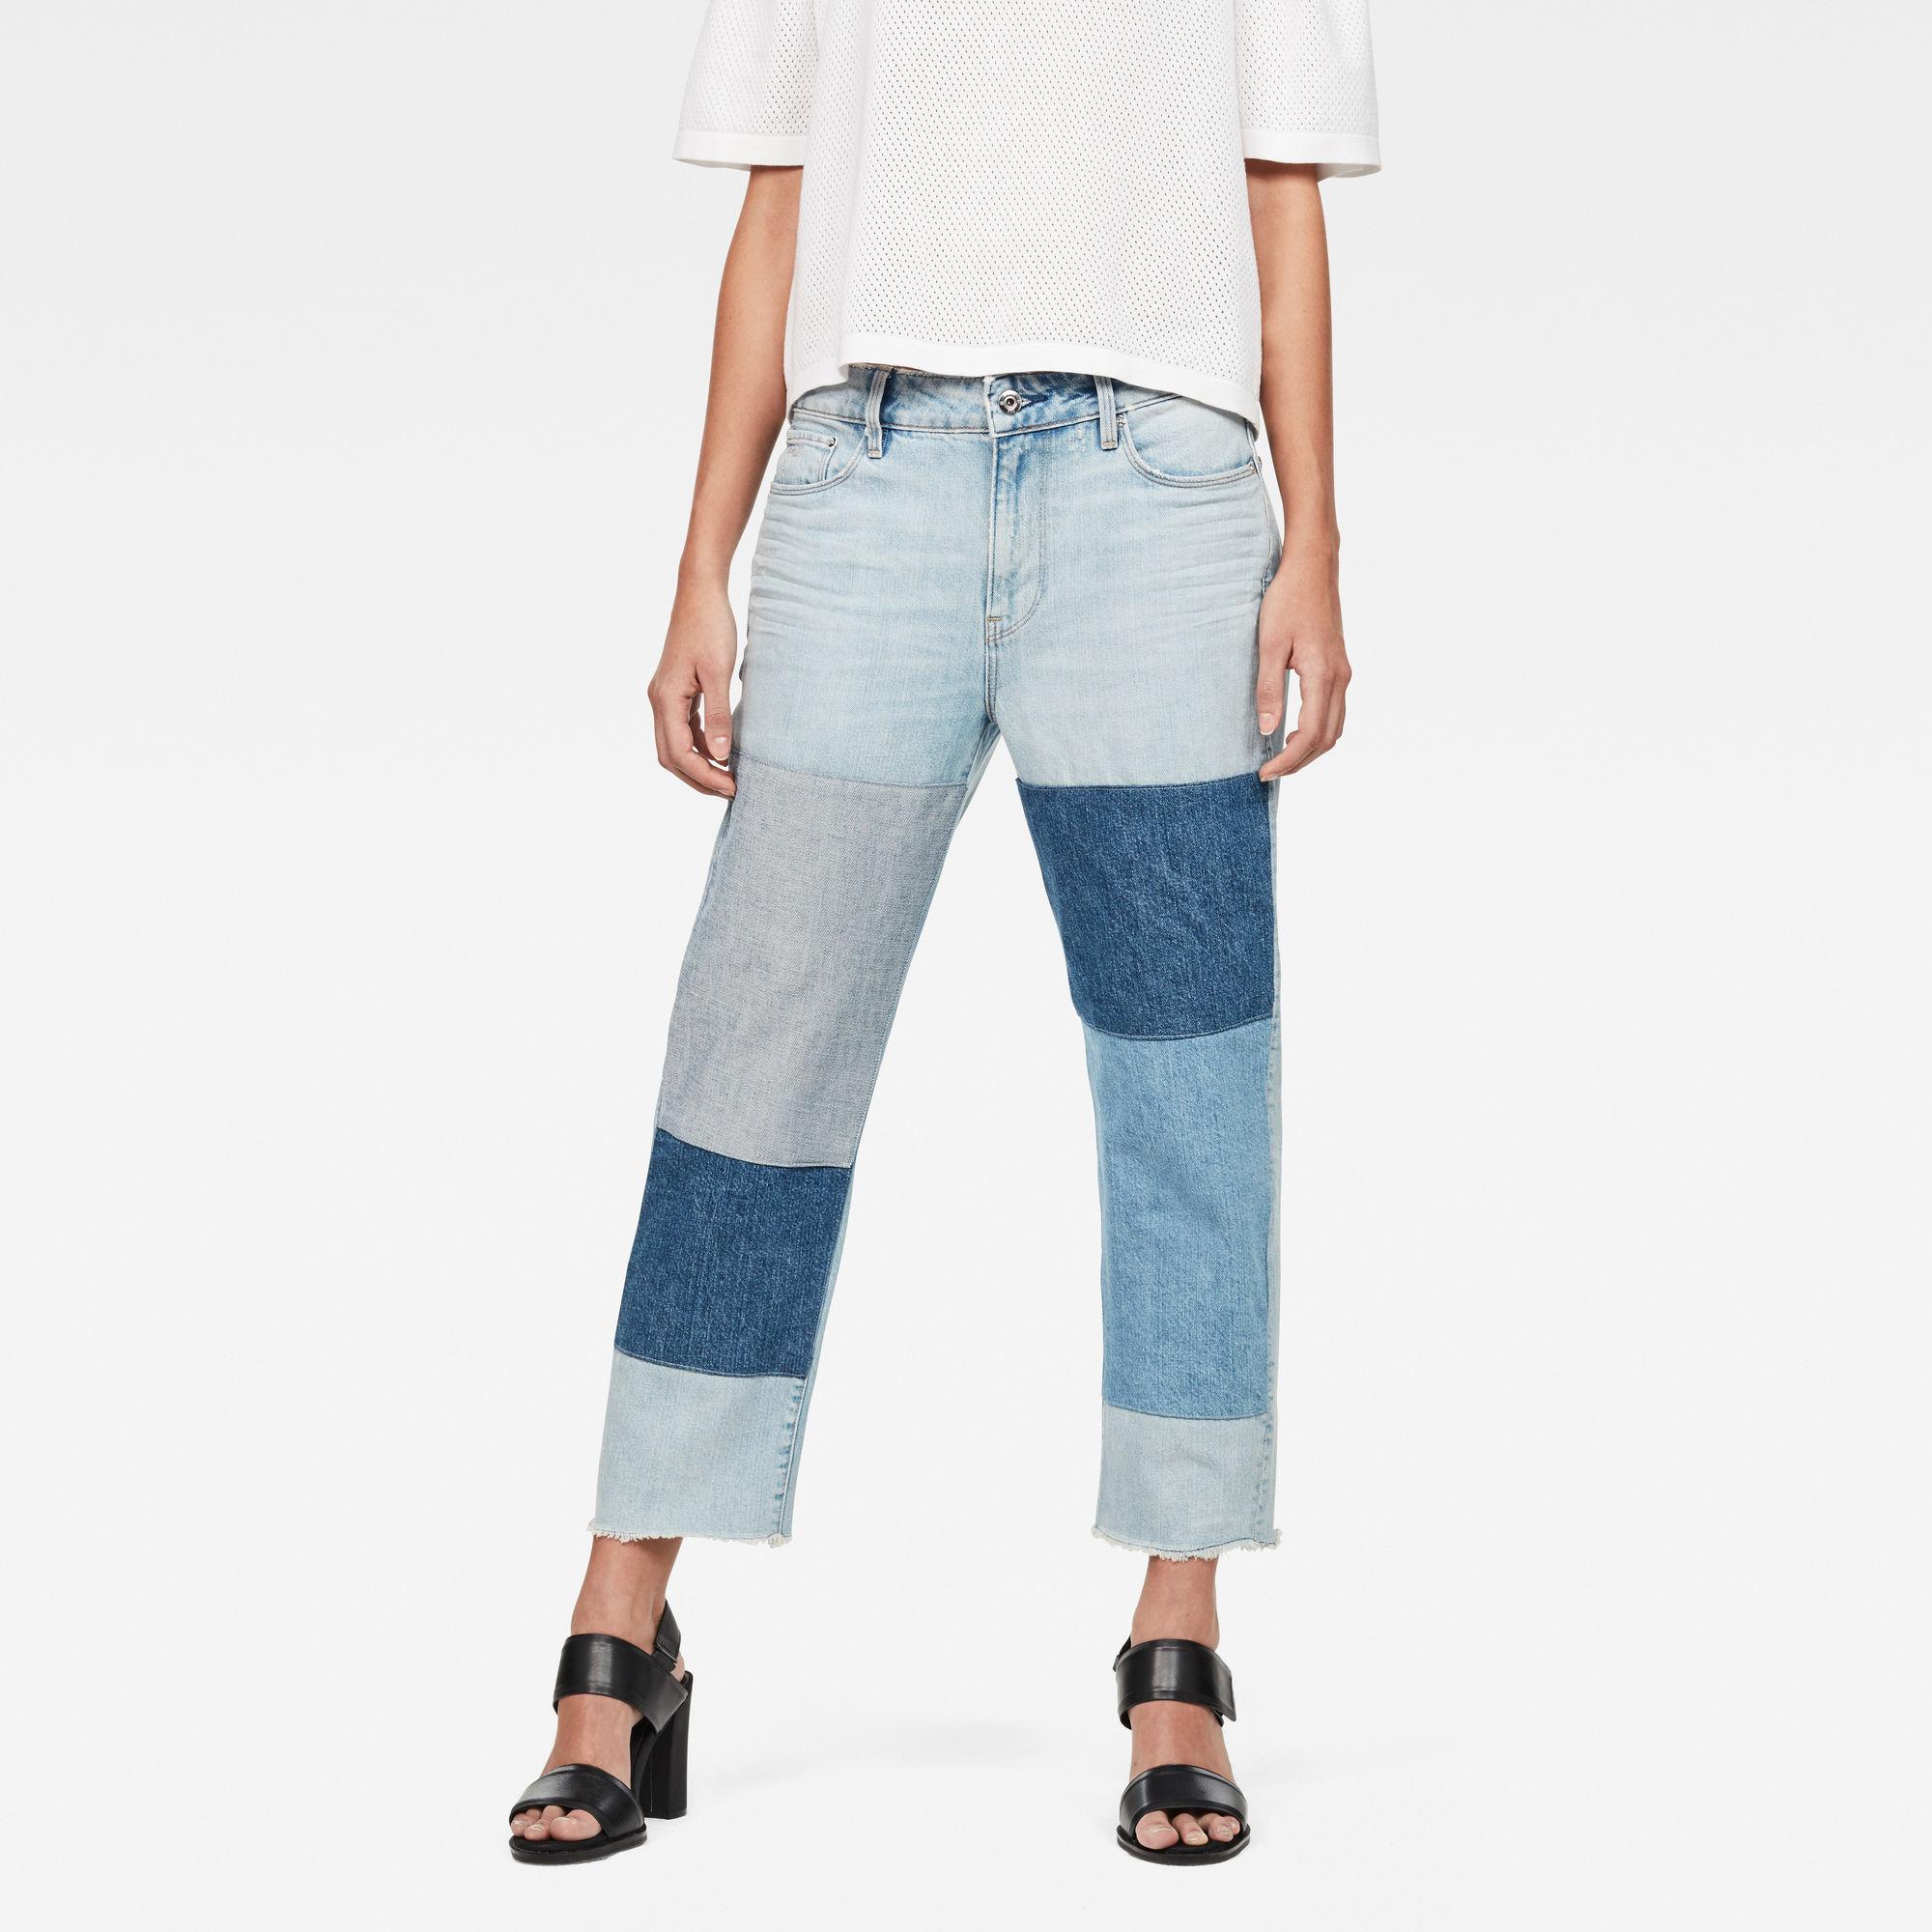 3301 Mid waist Boyfriend Ripped 7 8-Length Jeans